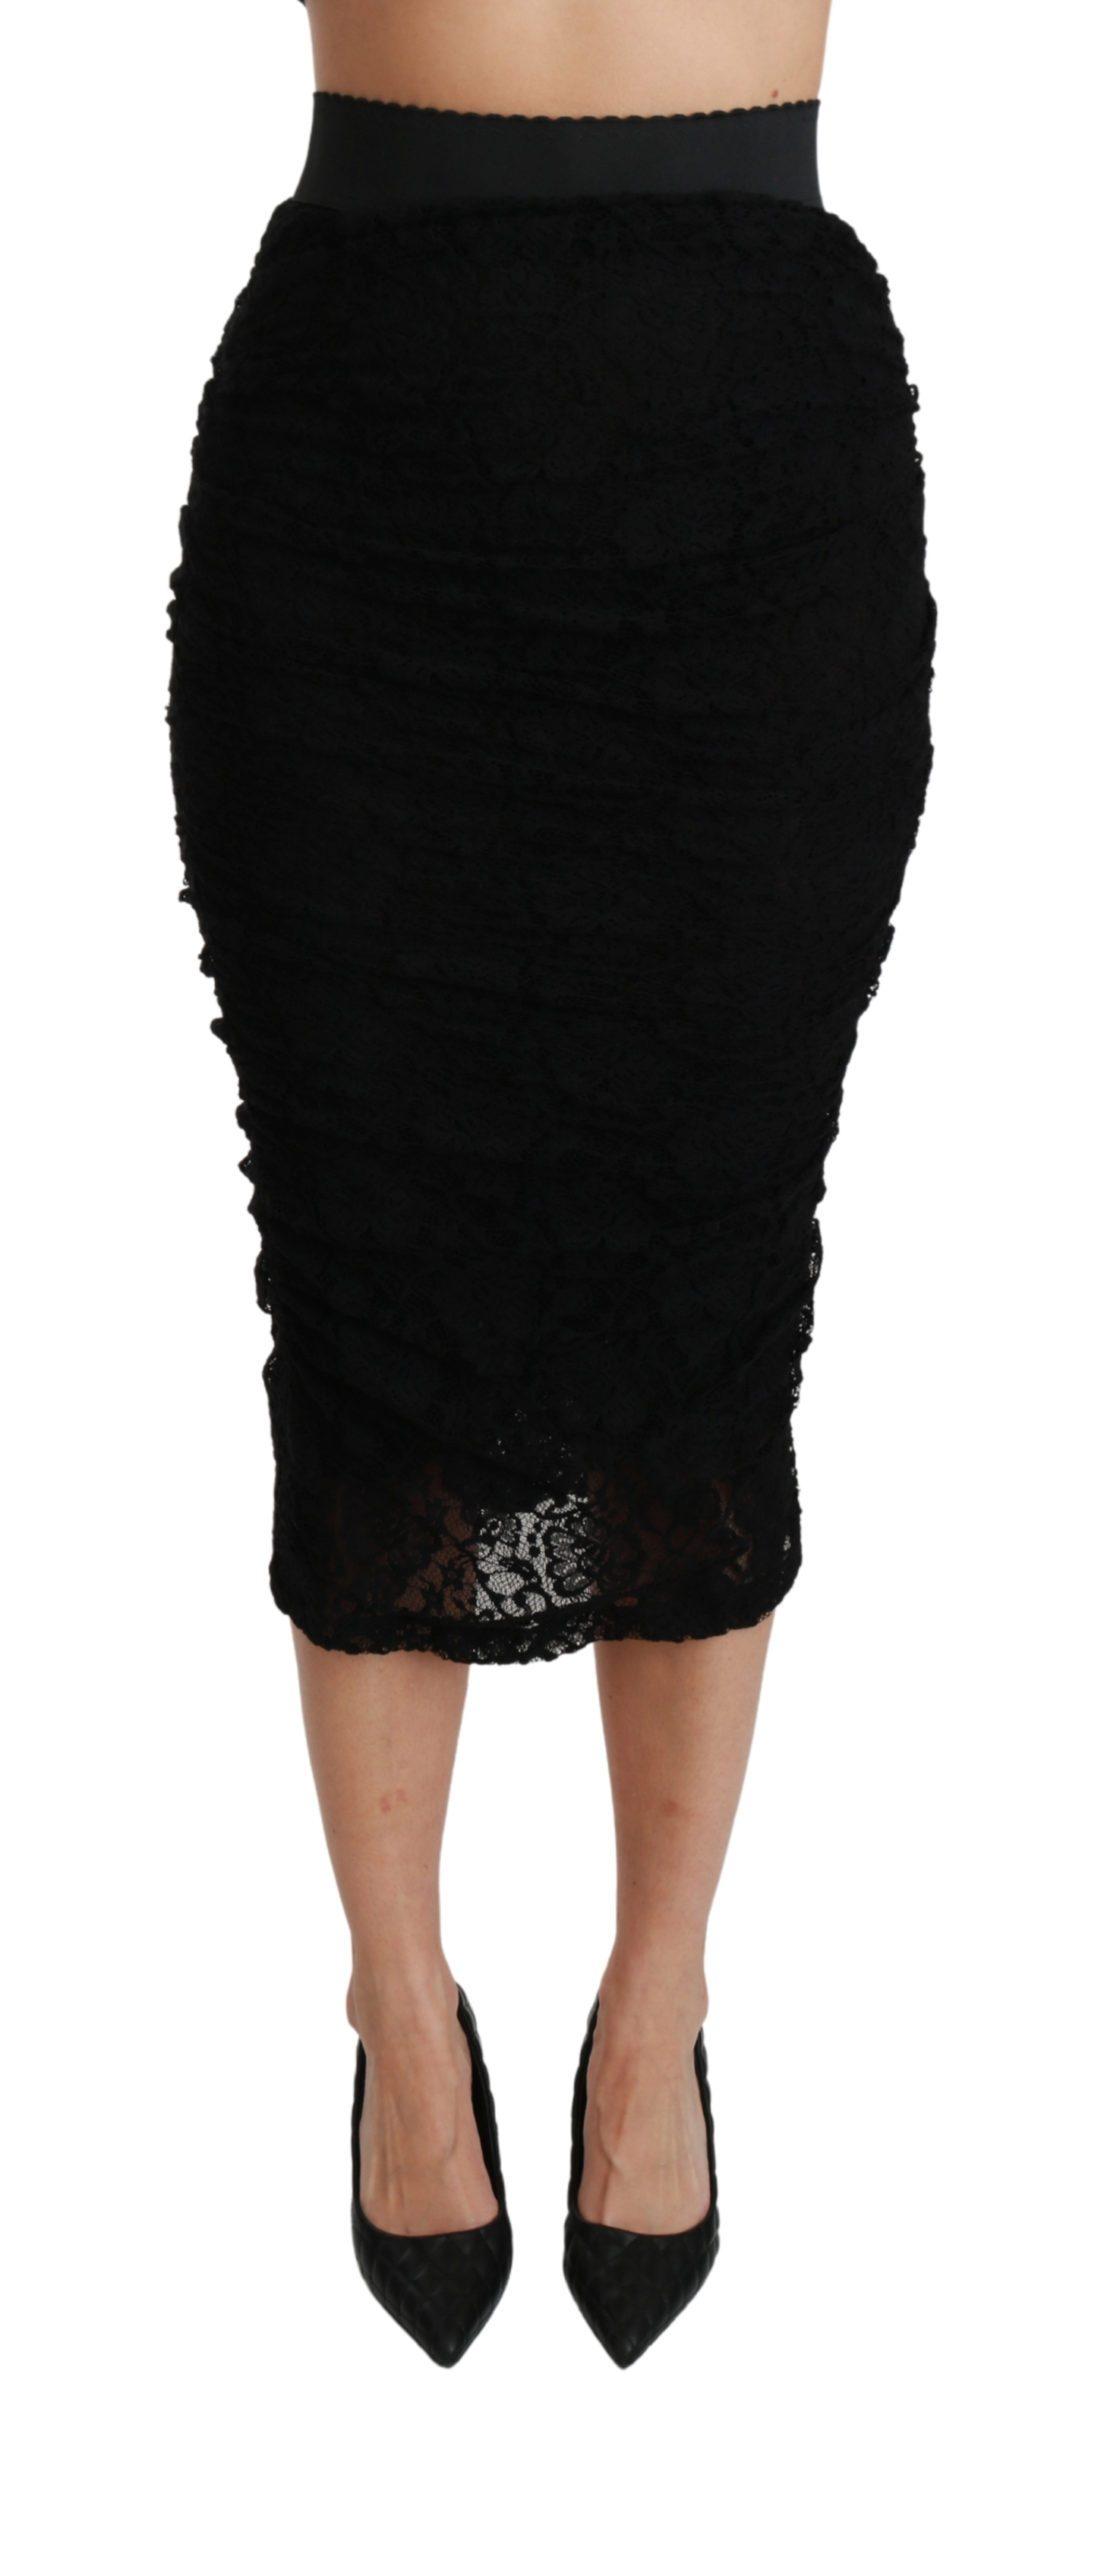 Dolce & Gabbana Women's Lace High Waist Pencil Cut Skirt Black SKI1406 - IT38 XS